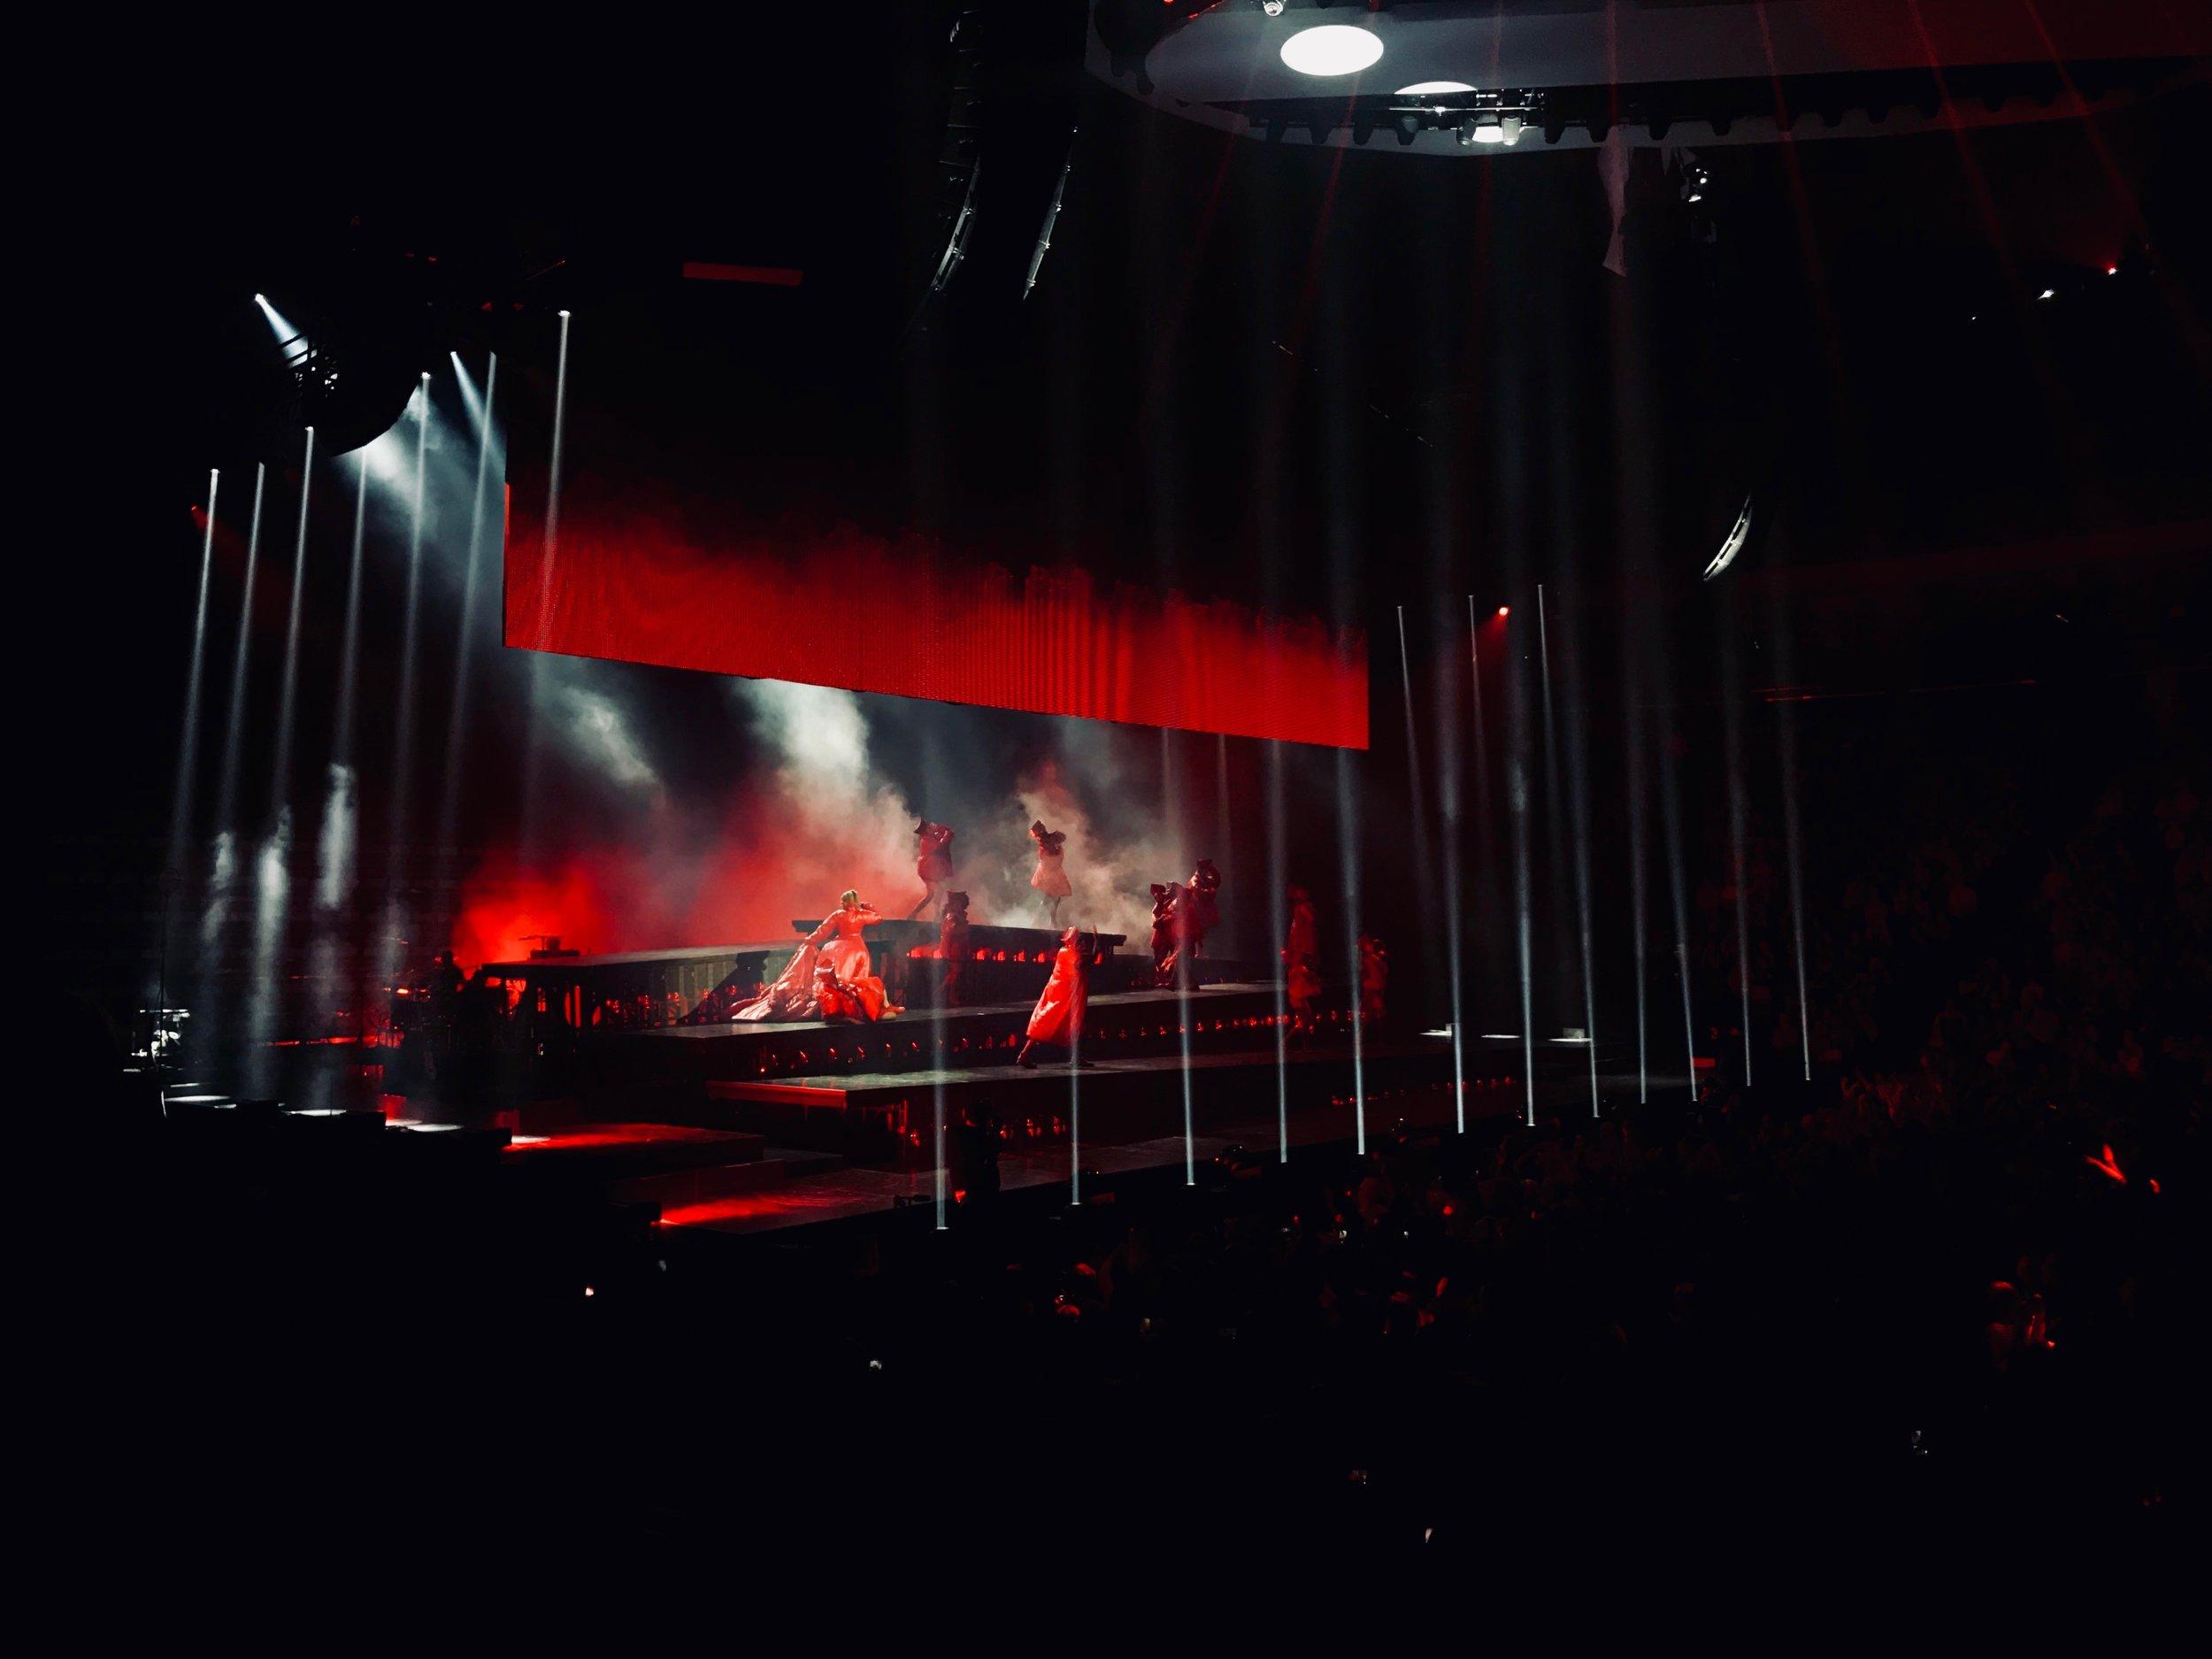 iPhone Photo: DerekPlease.com